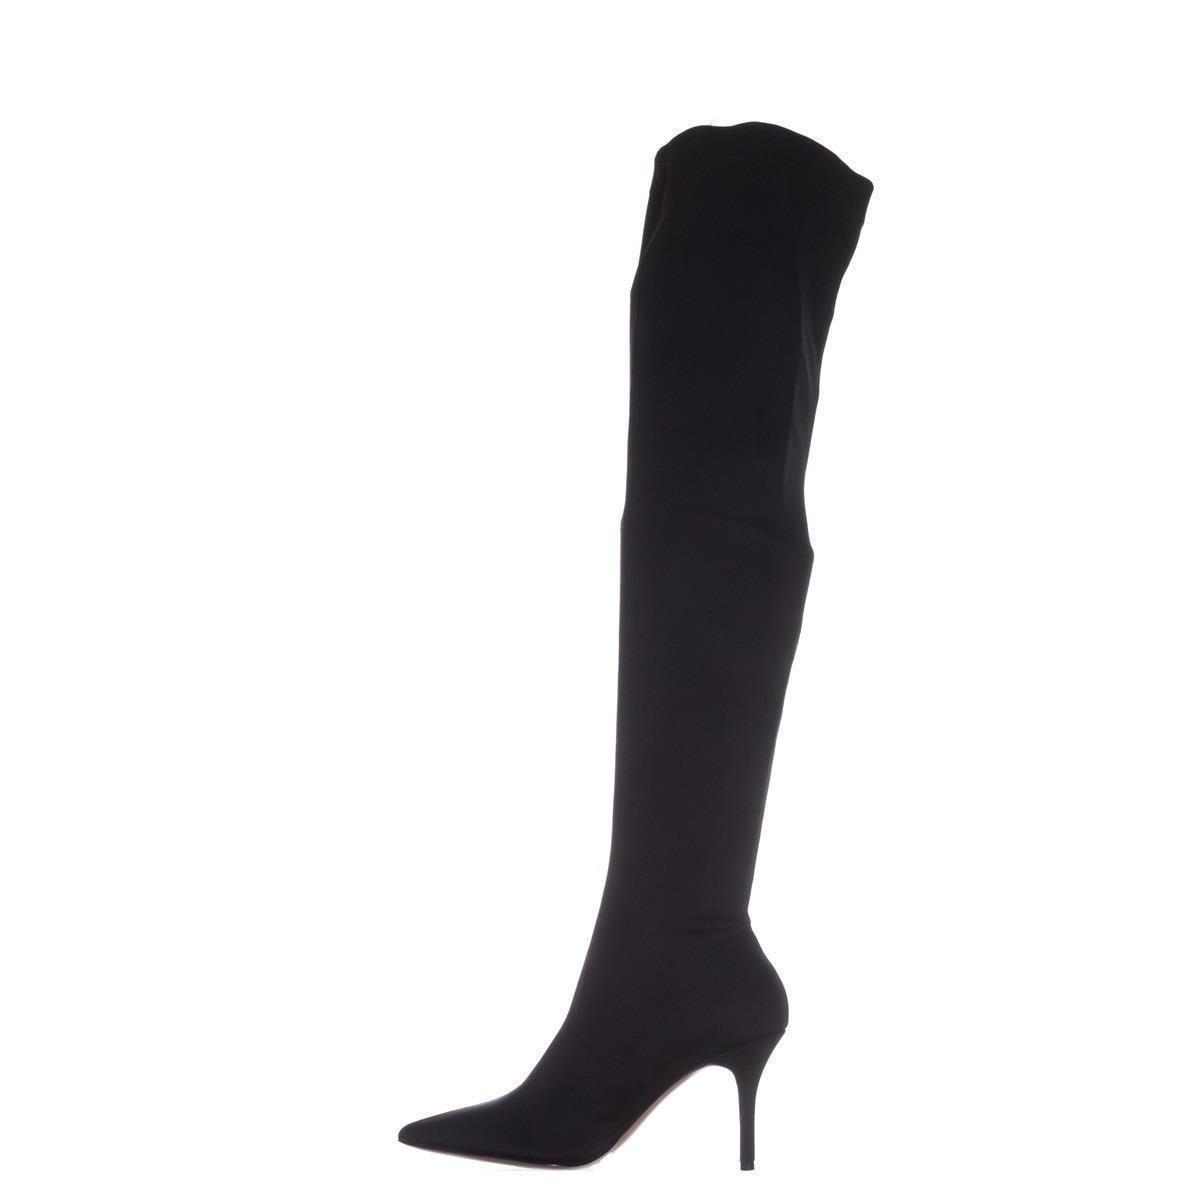 INC International Concepts Stiefel Frauen Zaliaa Spitzenschuhe Fashion Stiefel Concepts a6c1a5